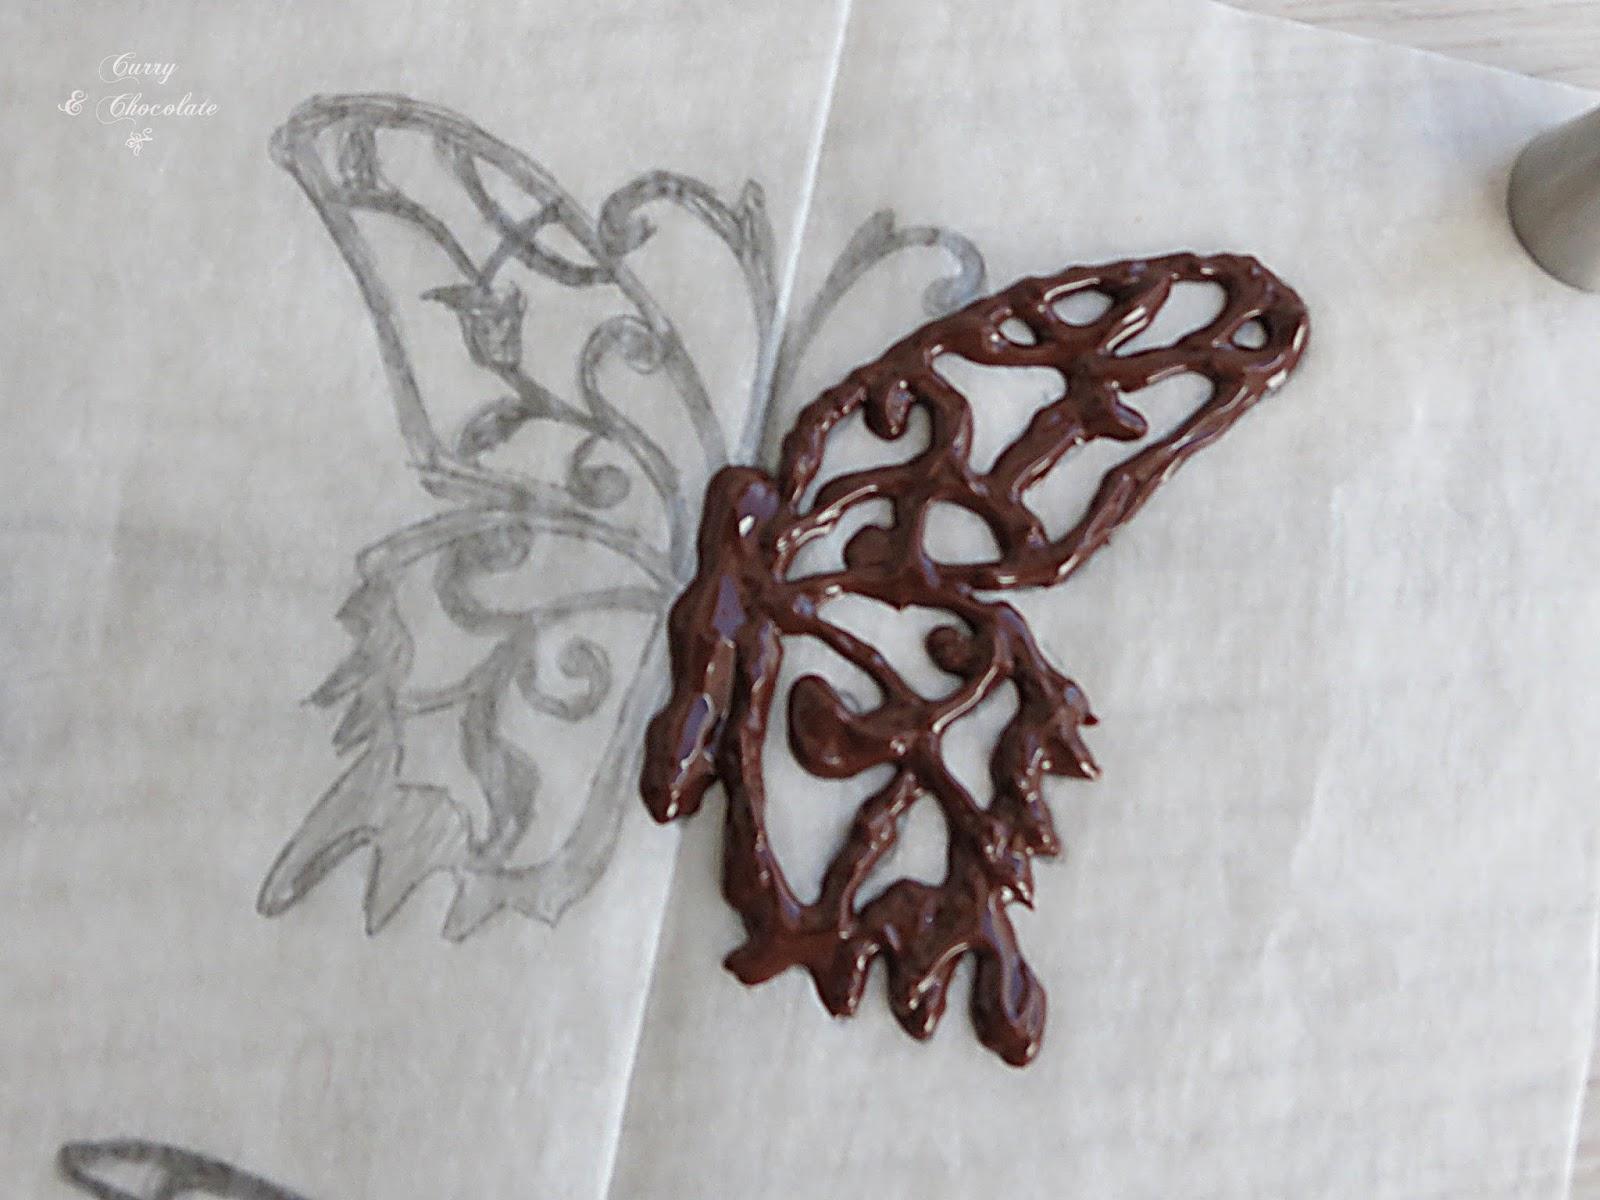 Dibujando la mariposa con chocolate